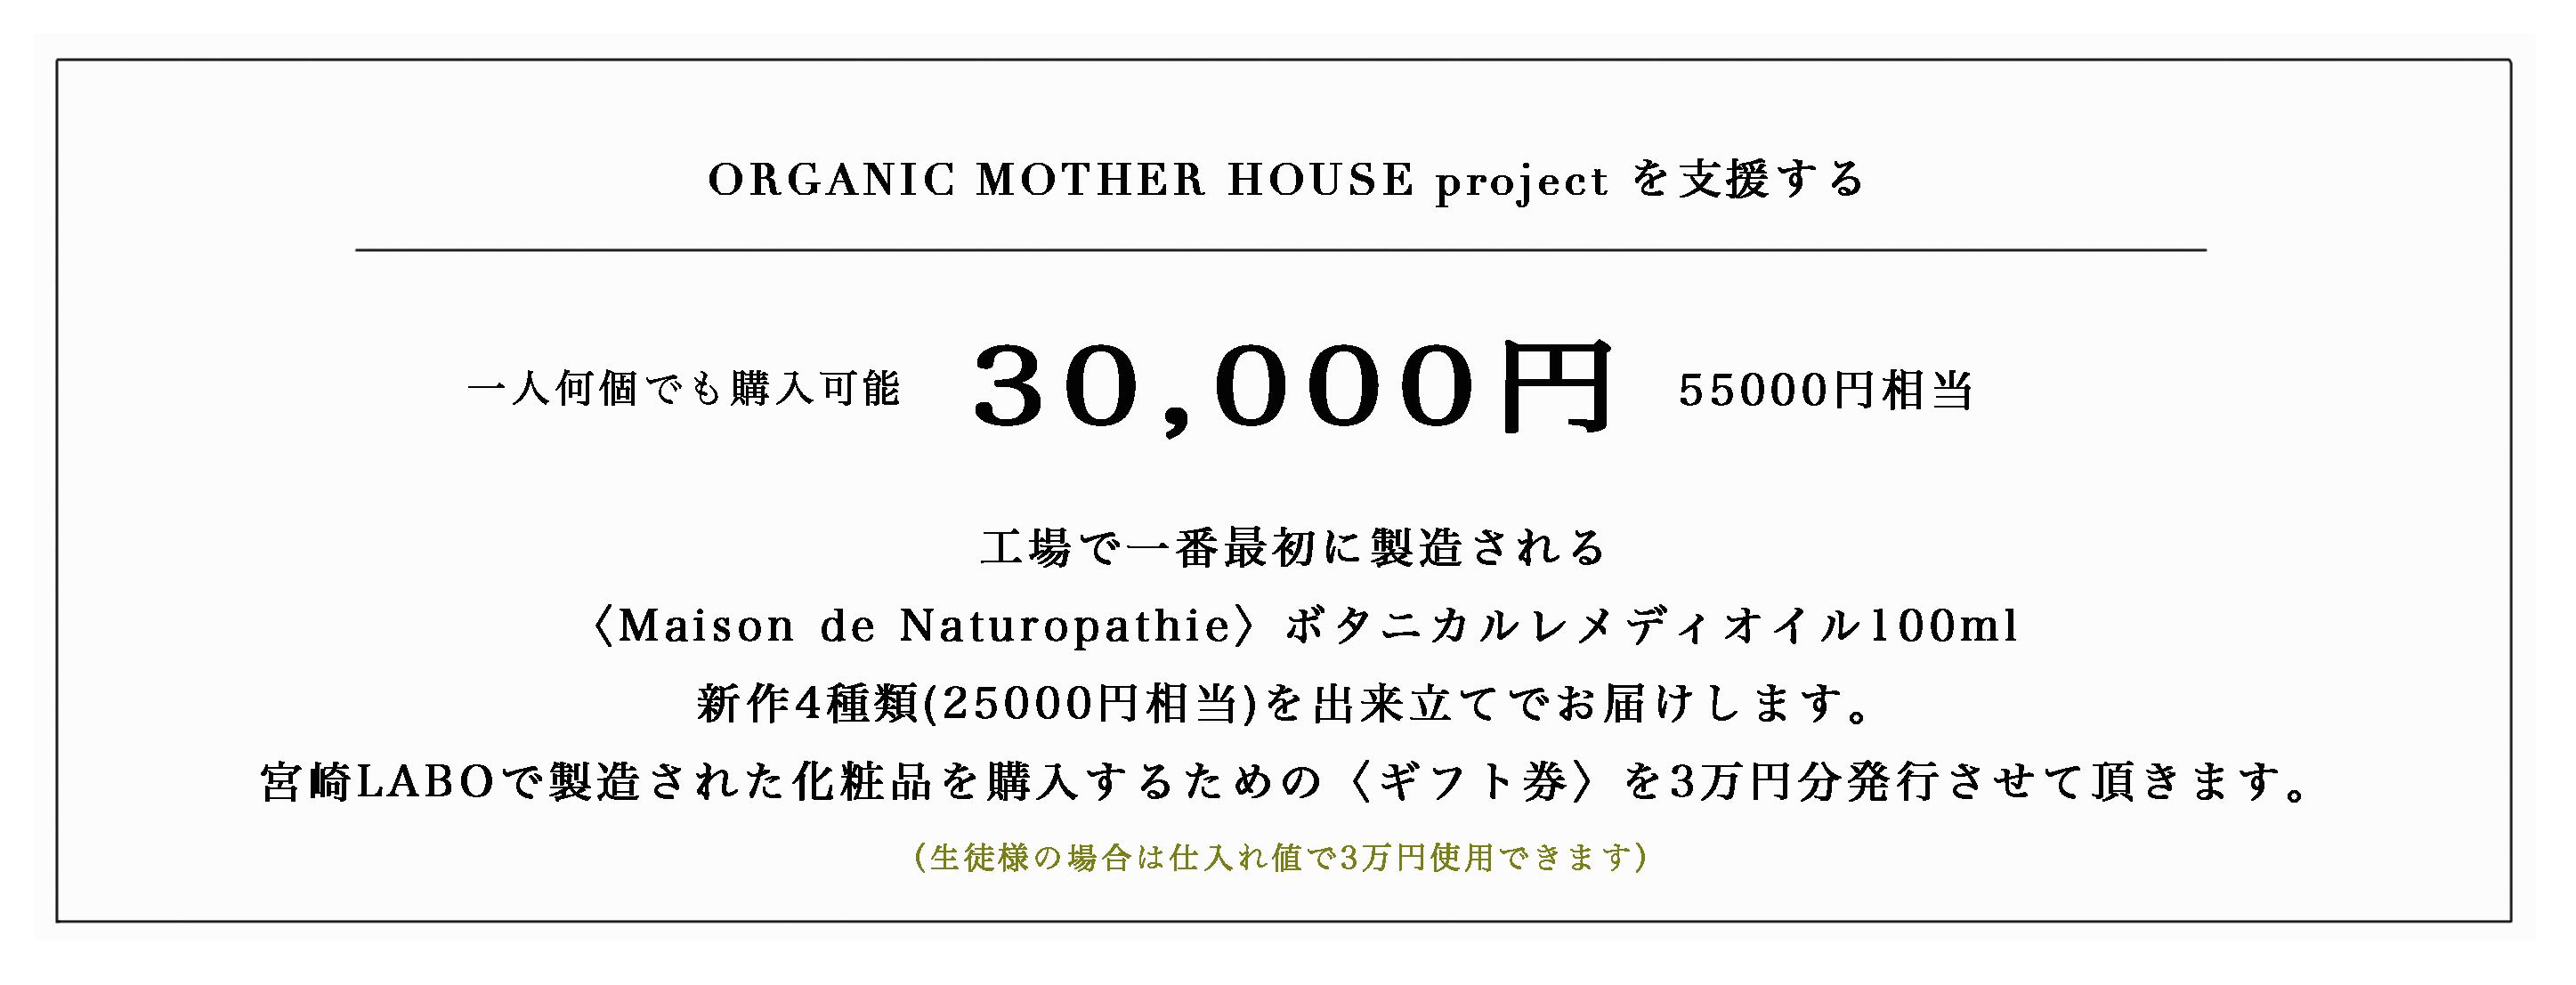 ORGANIC MOTHER HOUSE〈植物調合美容研究所〉3万